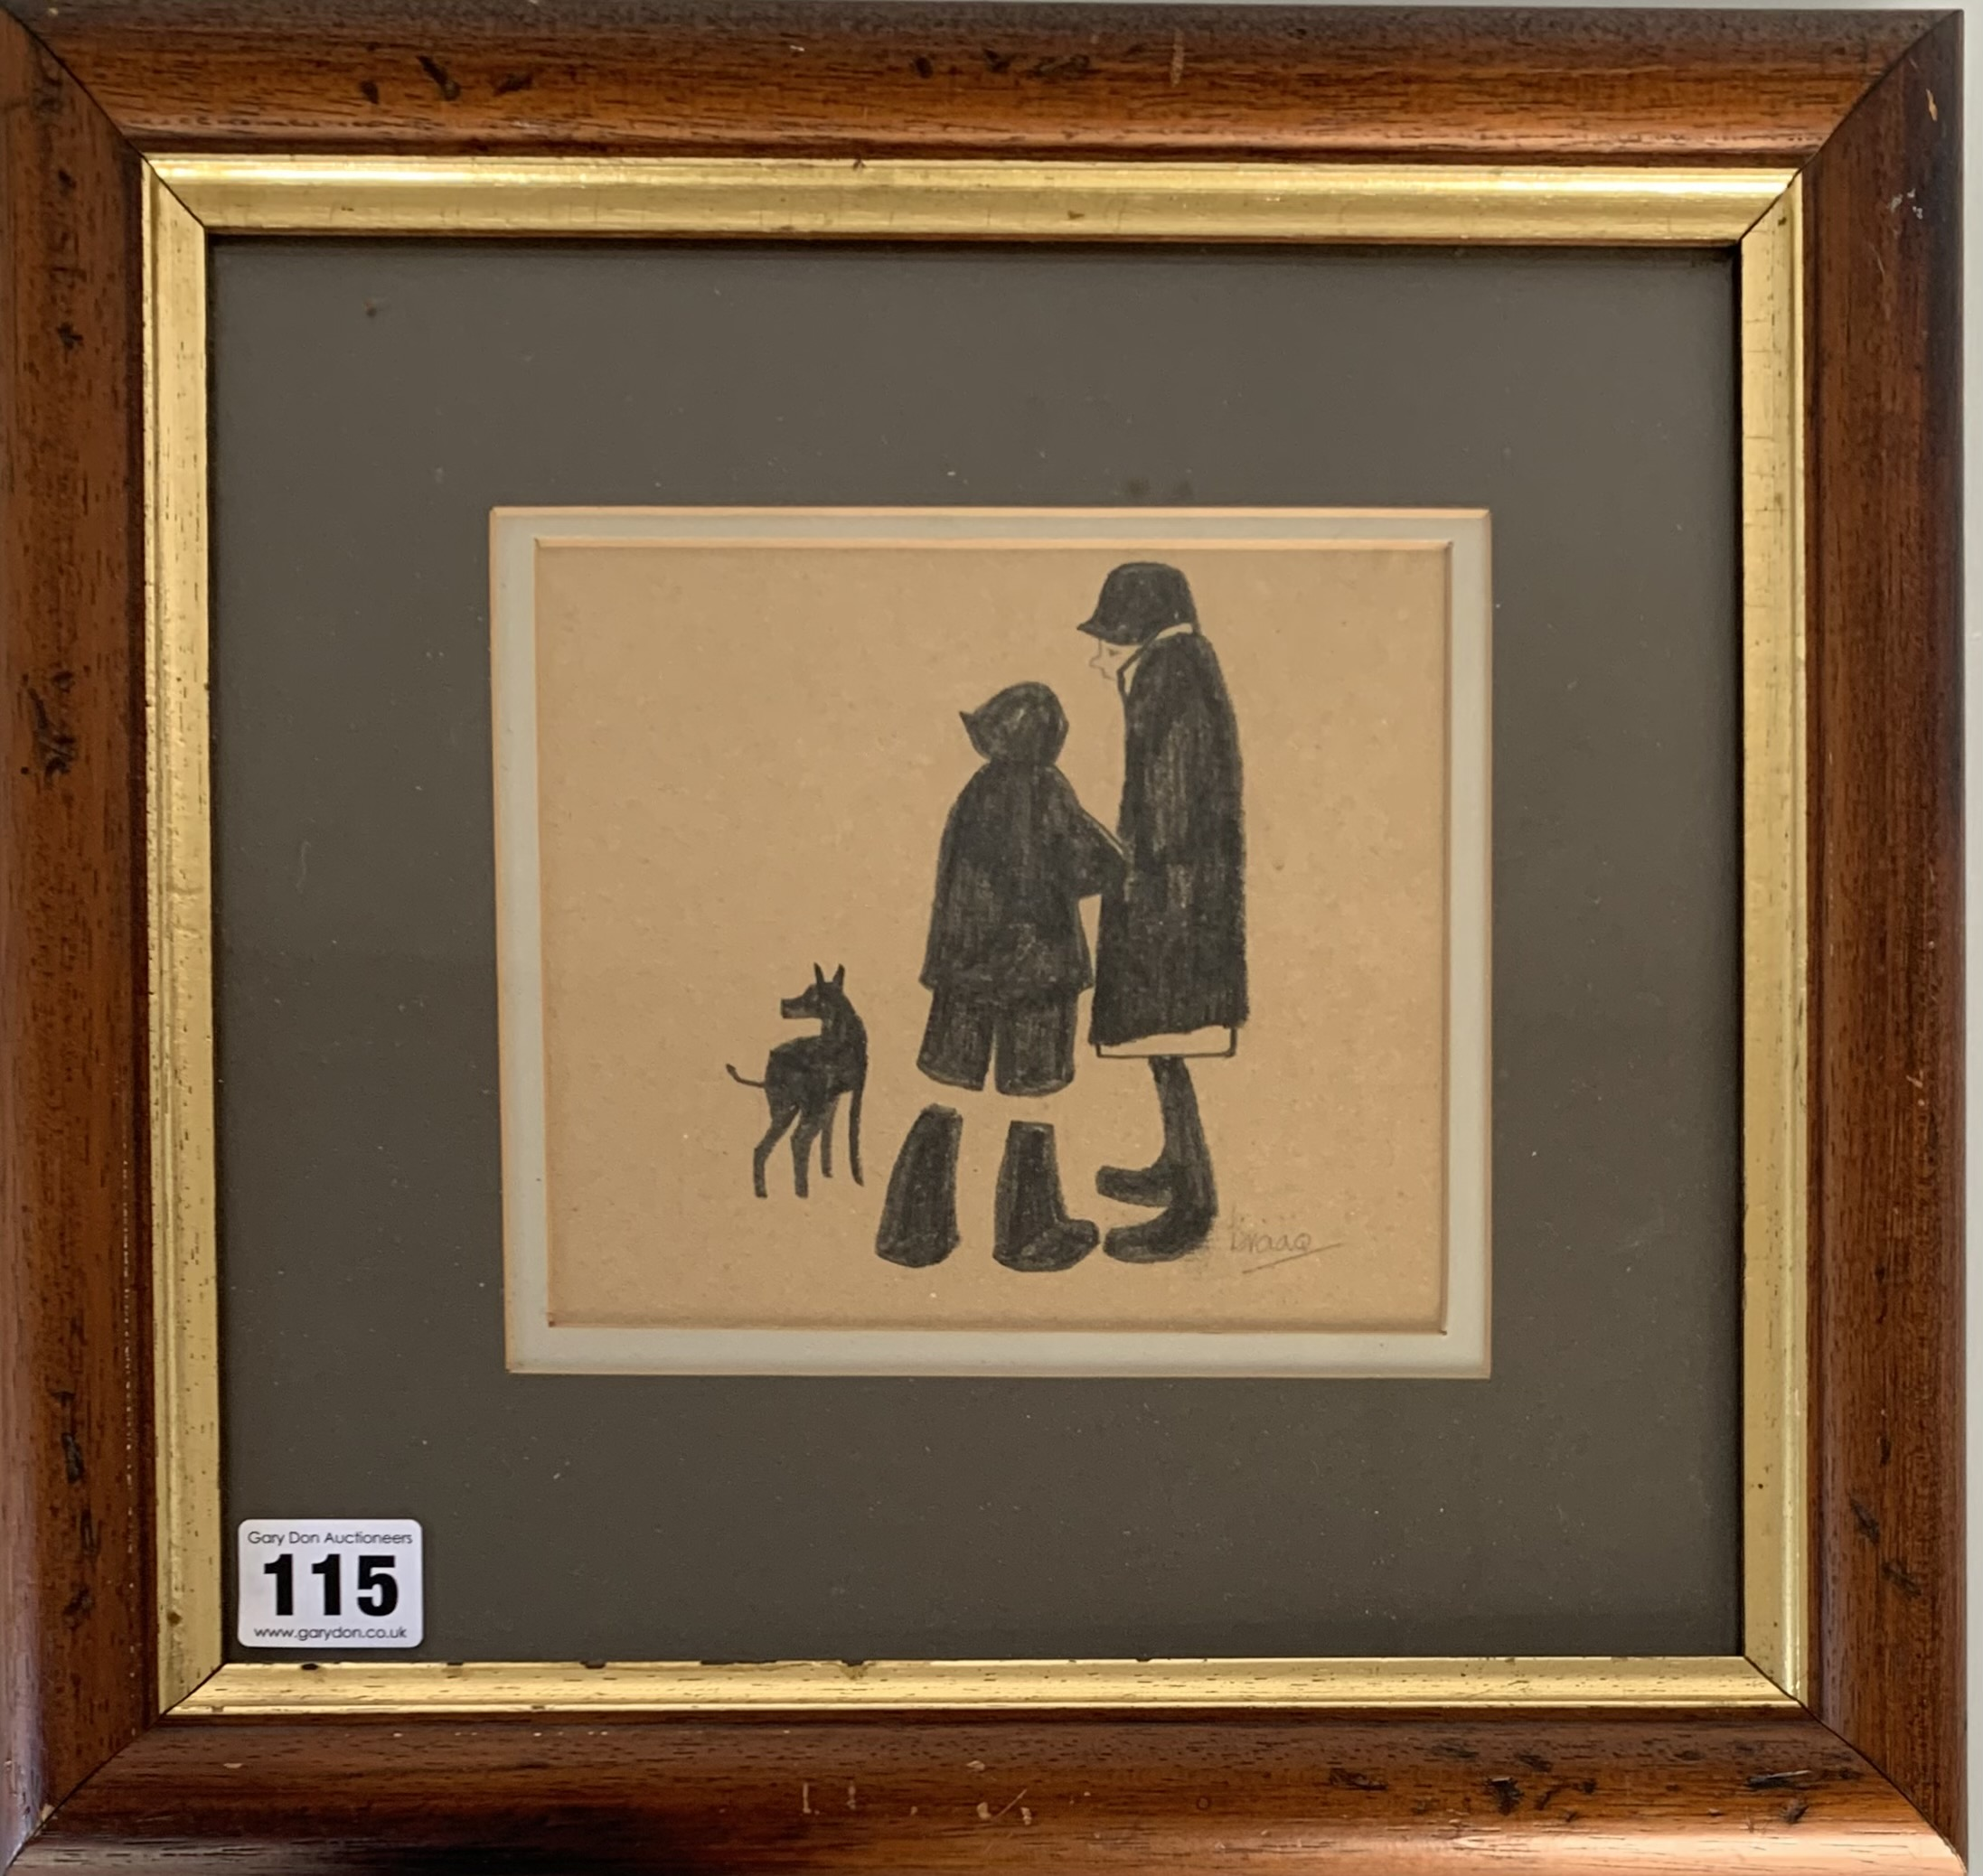 "Brian Shields (Braaq) pencil drawing of woman, boy and dog, signed 'braaq'. Image 6.25"" x 5.25"","